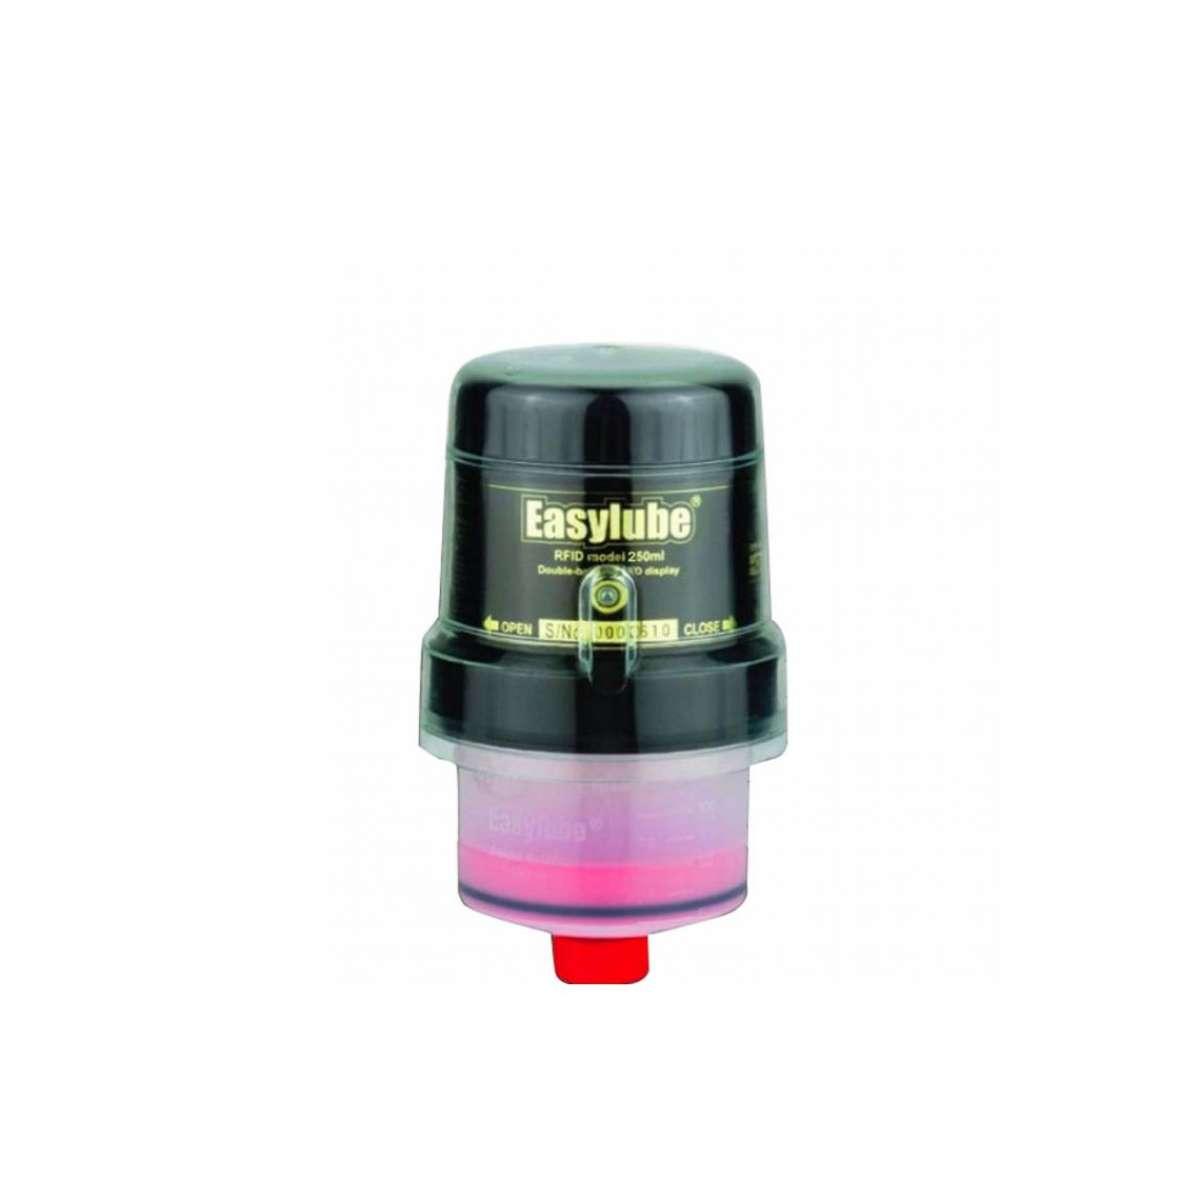 Easylube Lubricator 250 ELITE Drive Unit & Protective Cover (250 ml Unit)